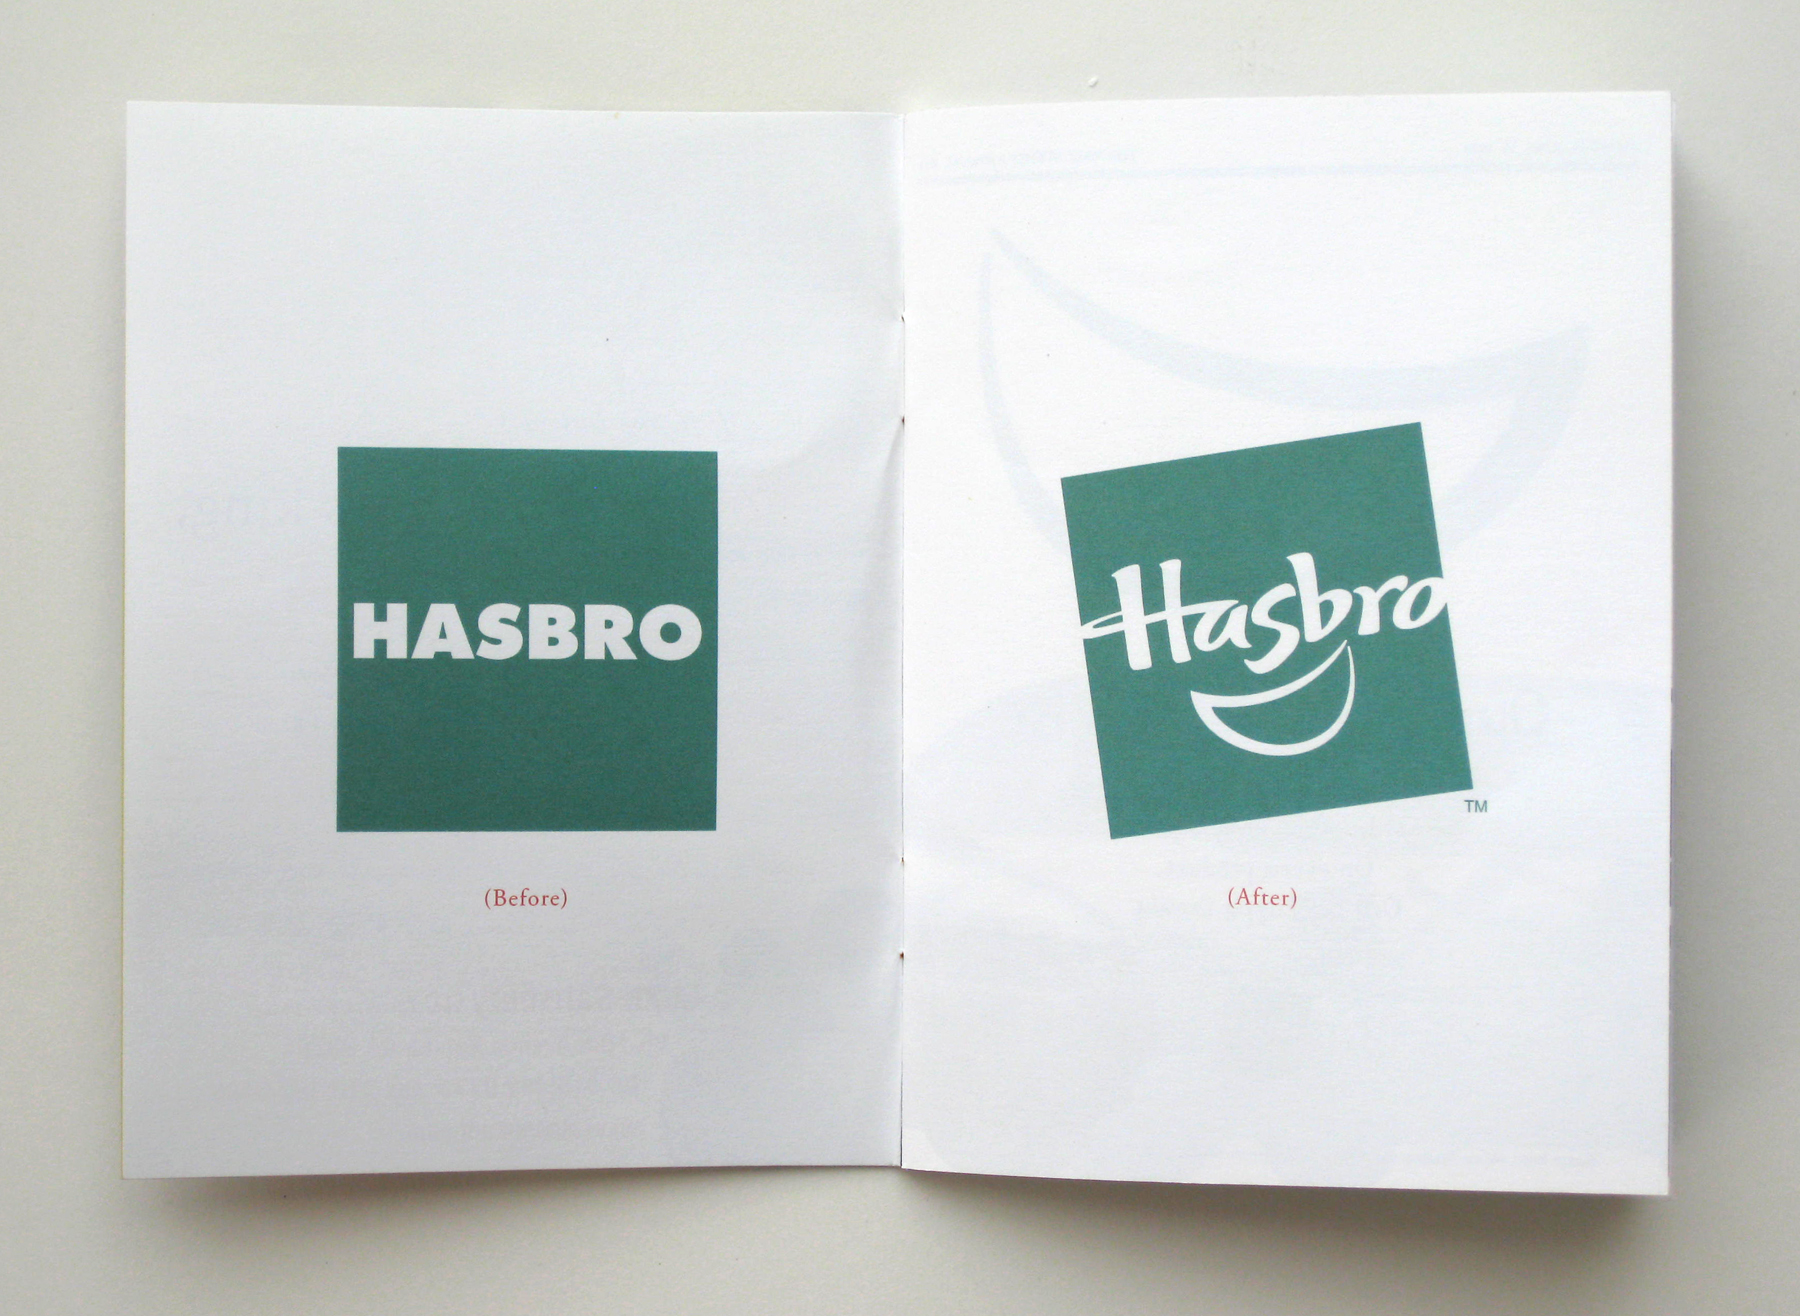 hasbro_page.jpg